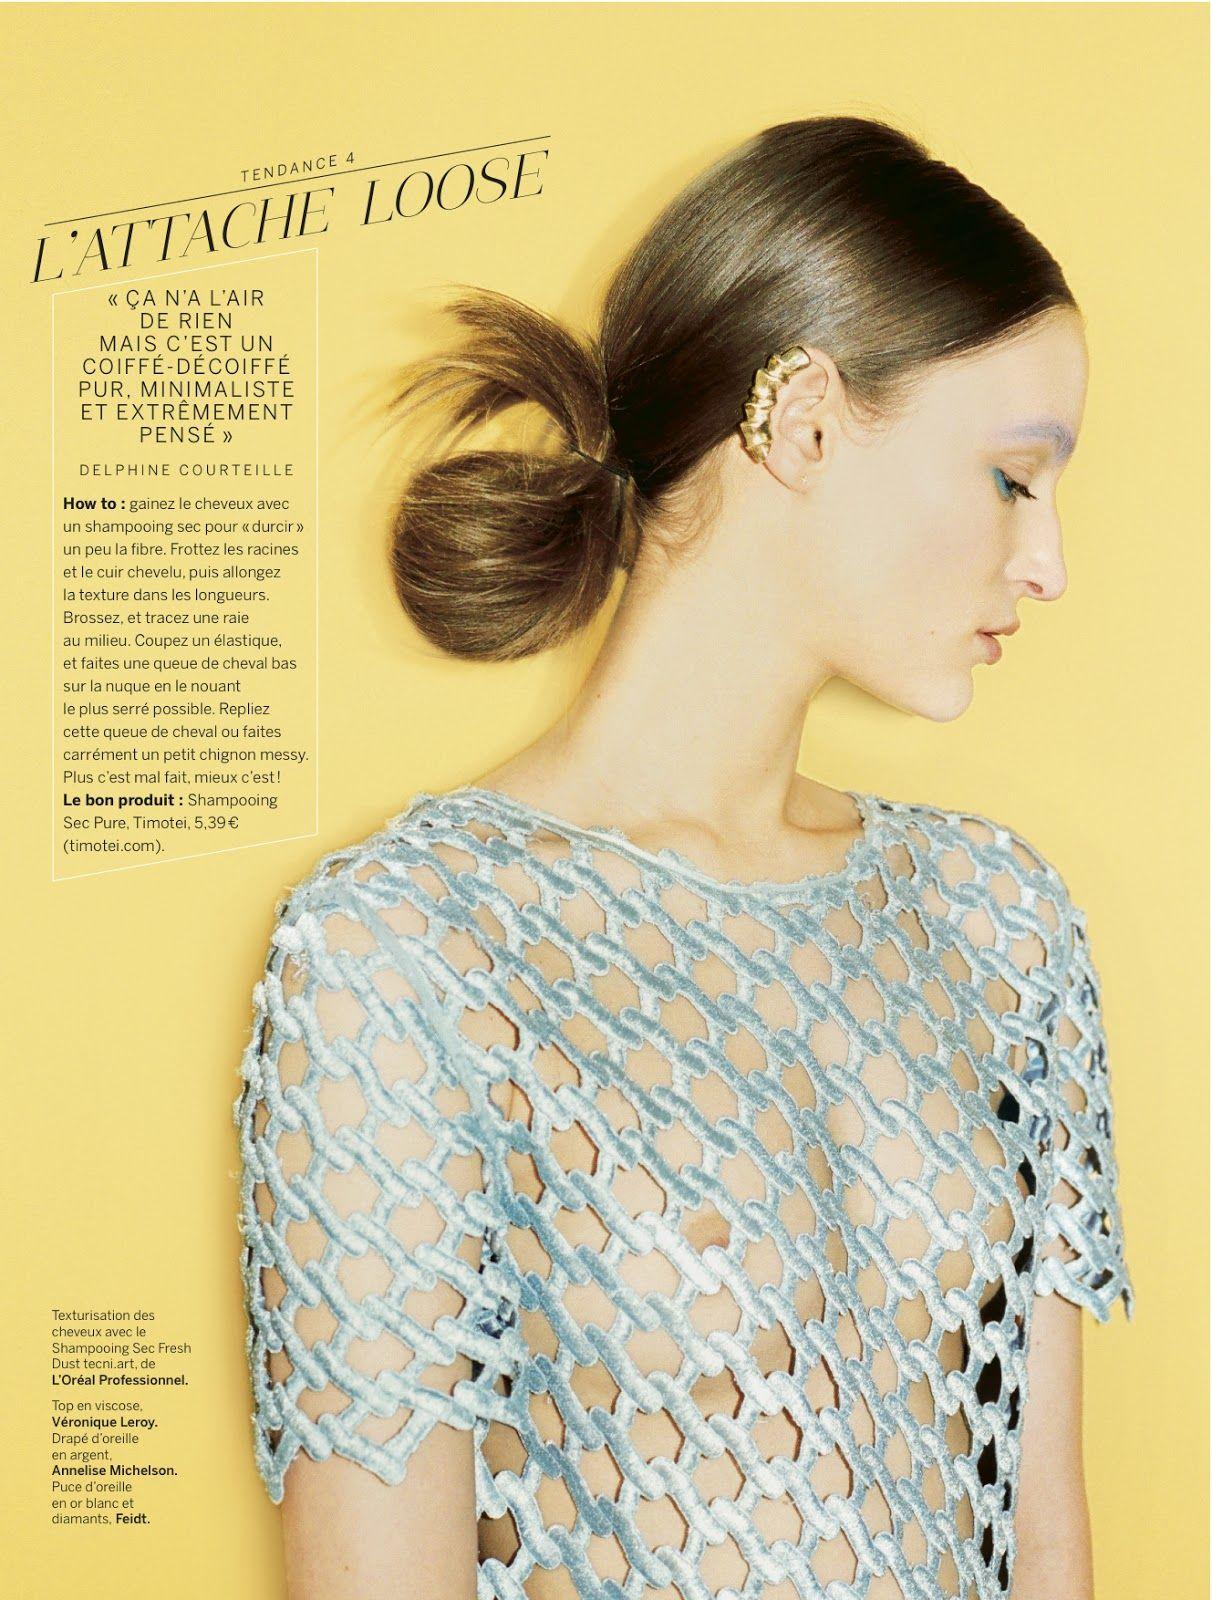 coupé décalé: franzi mueller by bastien lattanzio for stylist france #008 6th june 2013   visual optimism; fashion editorials, shows, campaigns & more!